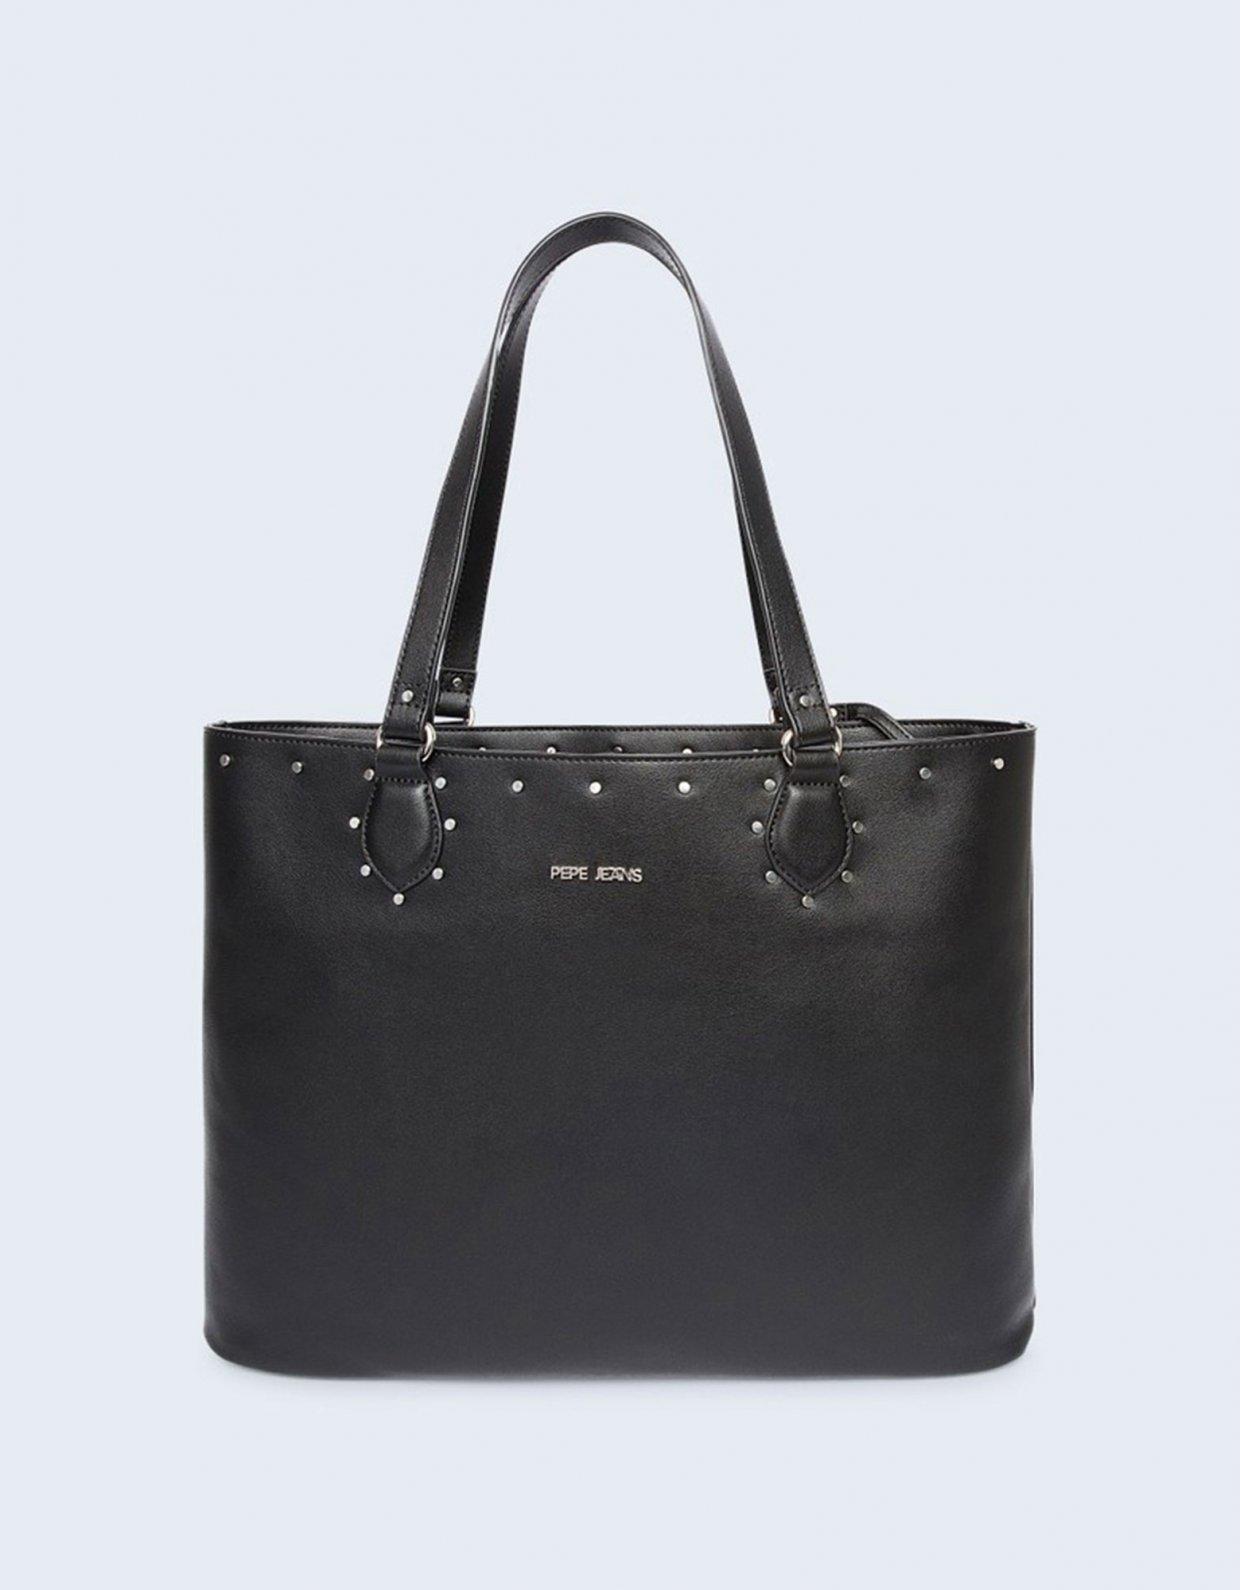 PEPE JEANS Tilda bag black